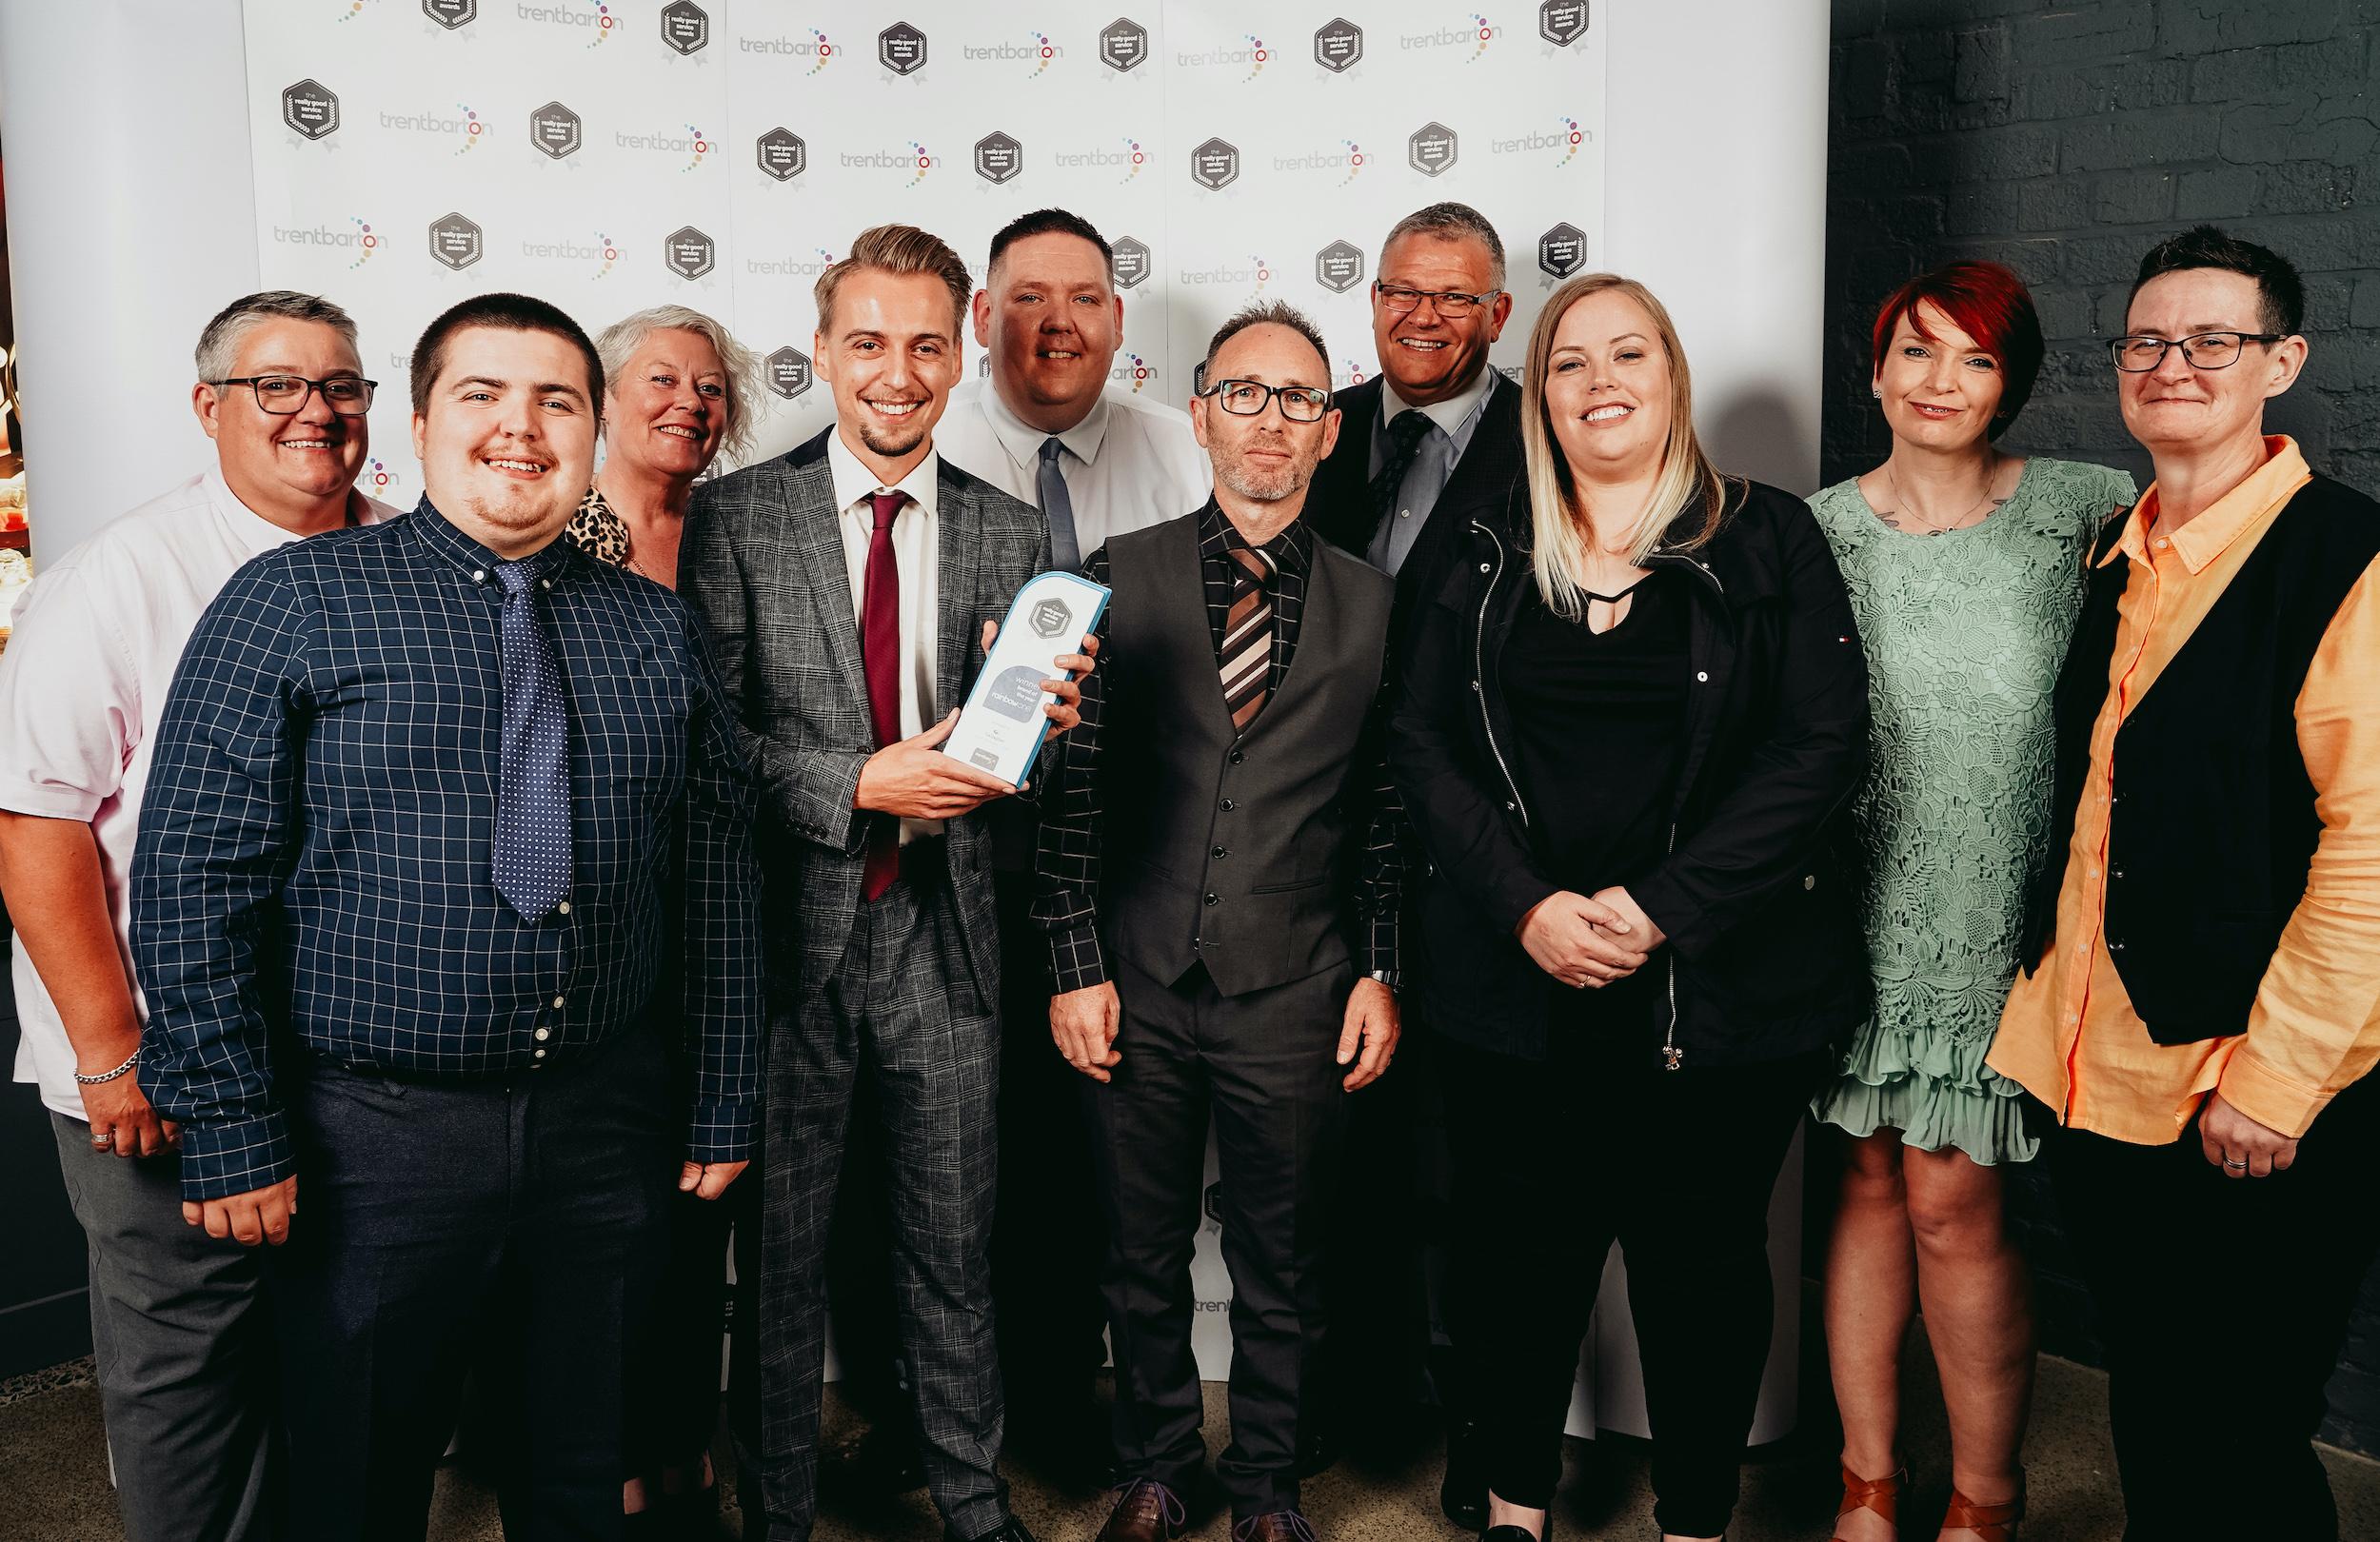 Driver David triumphs at trentbarton awards